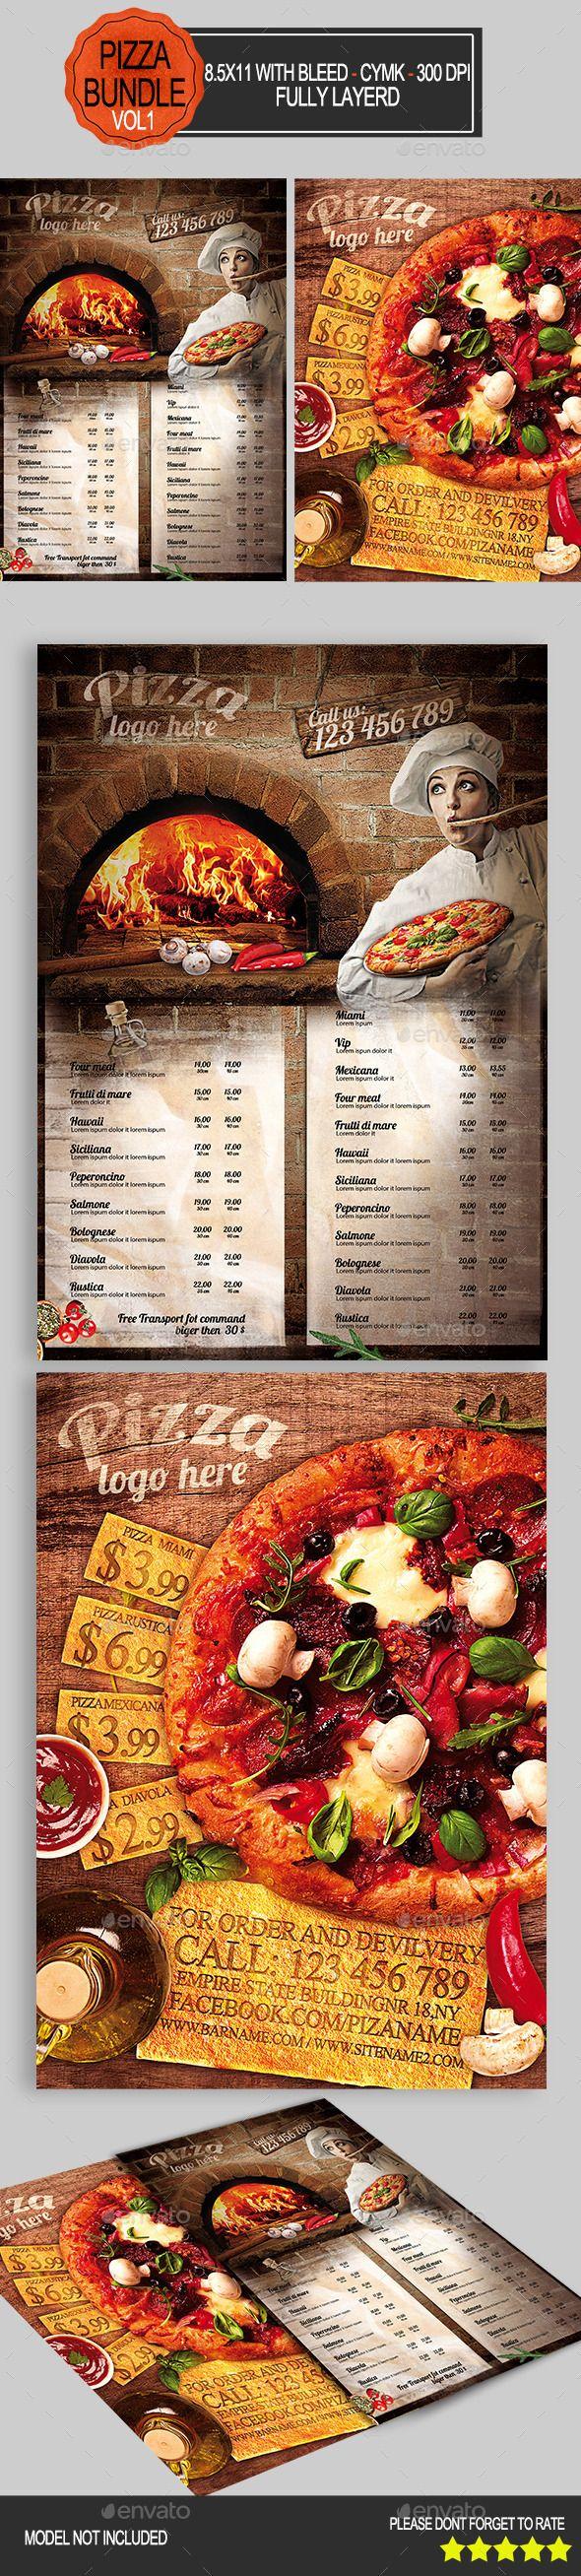 Pizza Flyer Bundle Template #design Download: http://graphicriver.net/item/pizza-flyer-bundle-vol1-/9342636?ref=ksioks